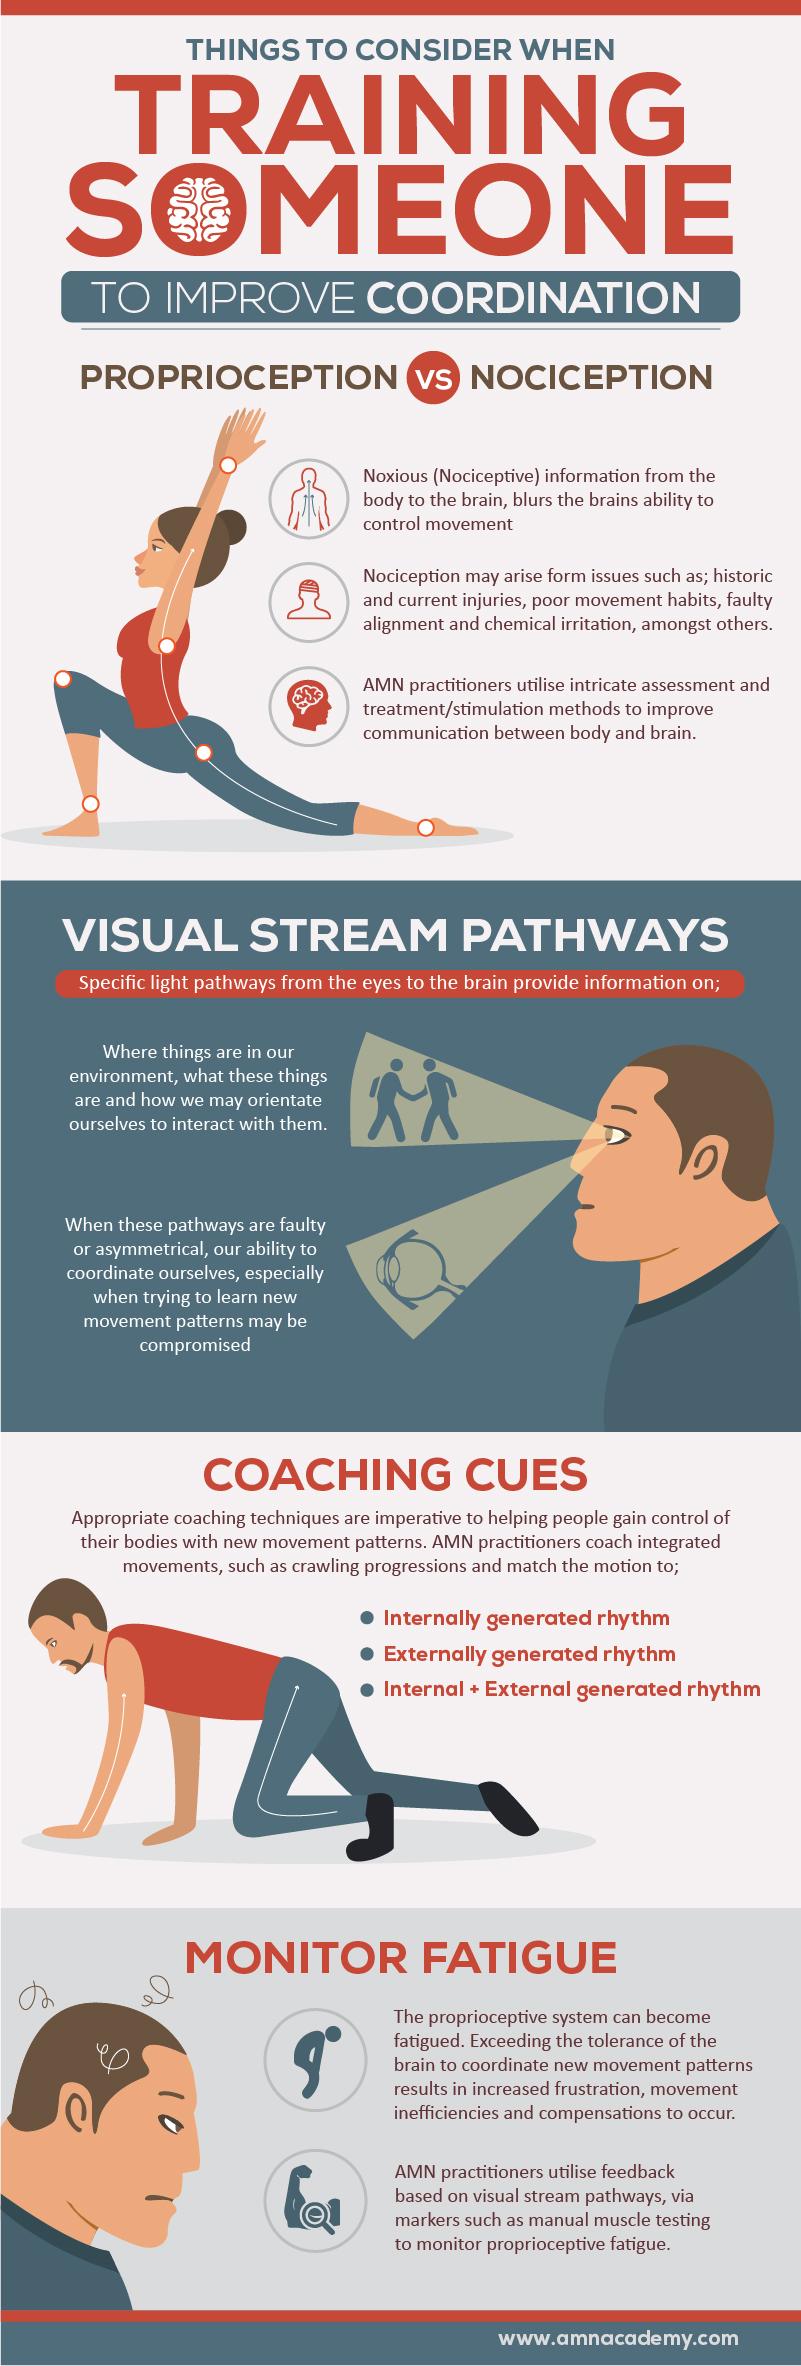 coordination infographic amn academy